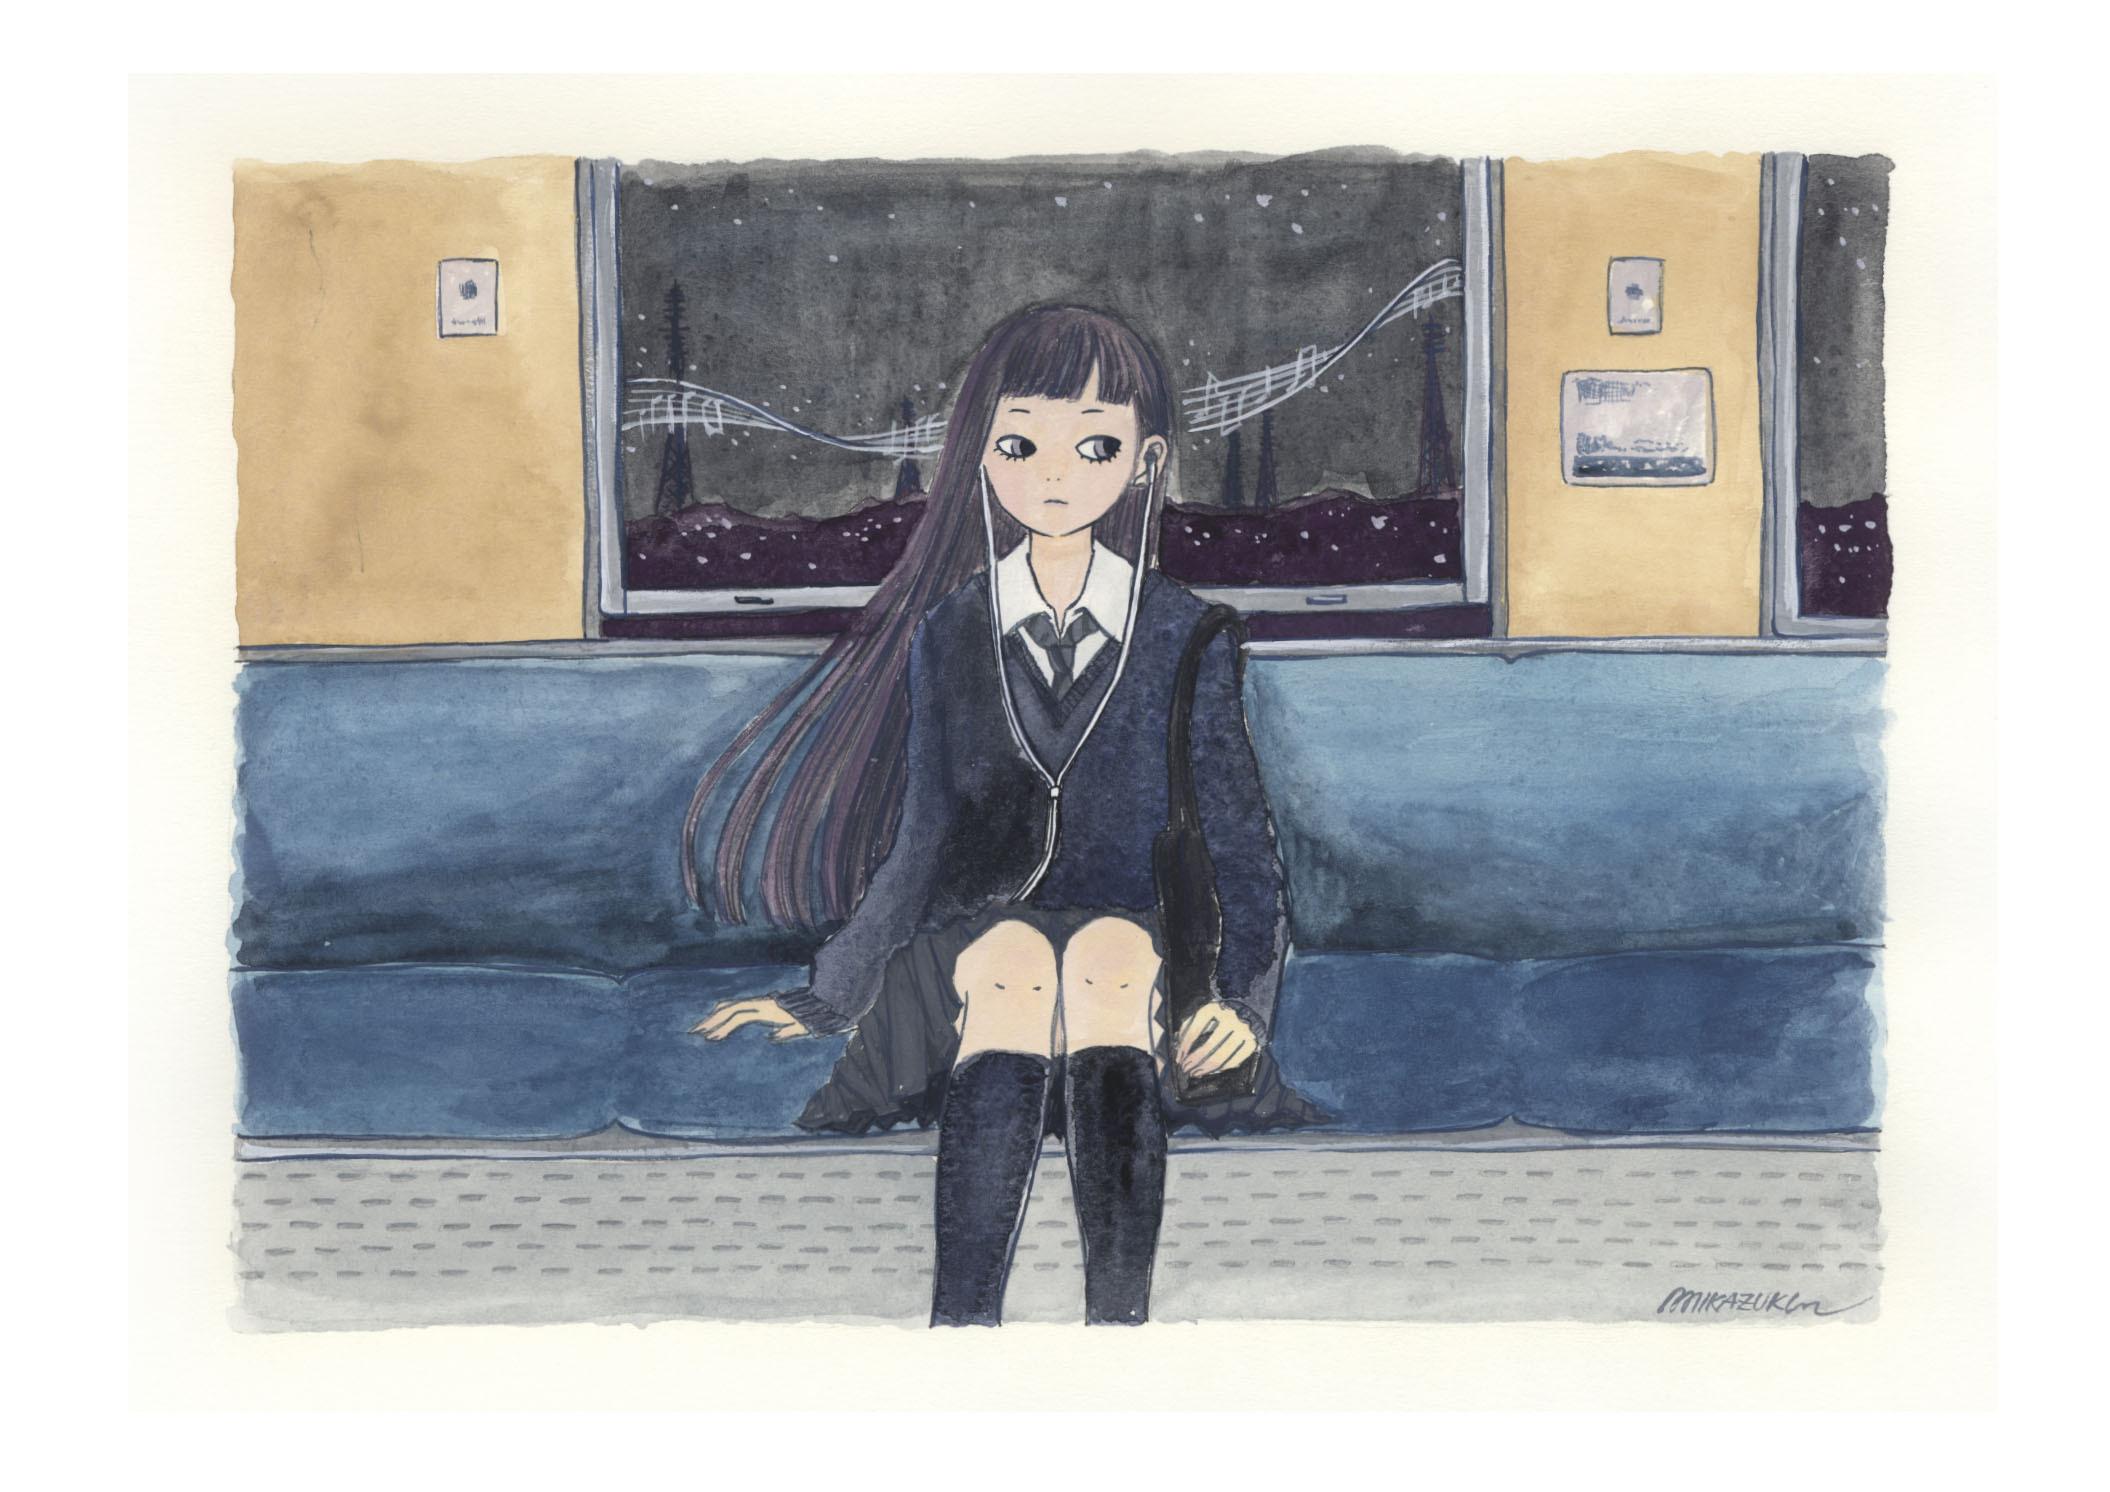 MIKAZUKI / ミカヅキ ミニポスター A4サイズ 「Night train music」